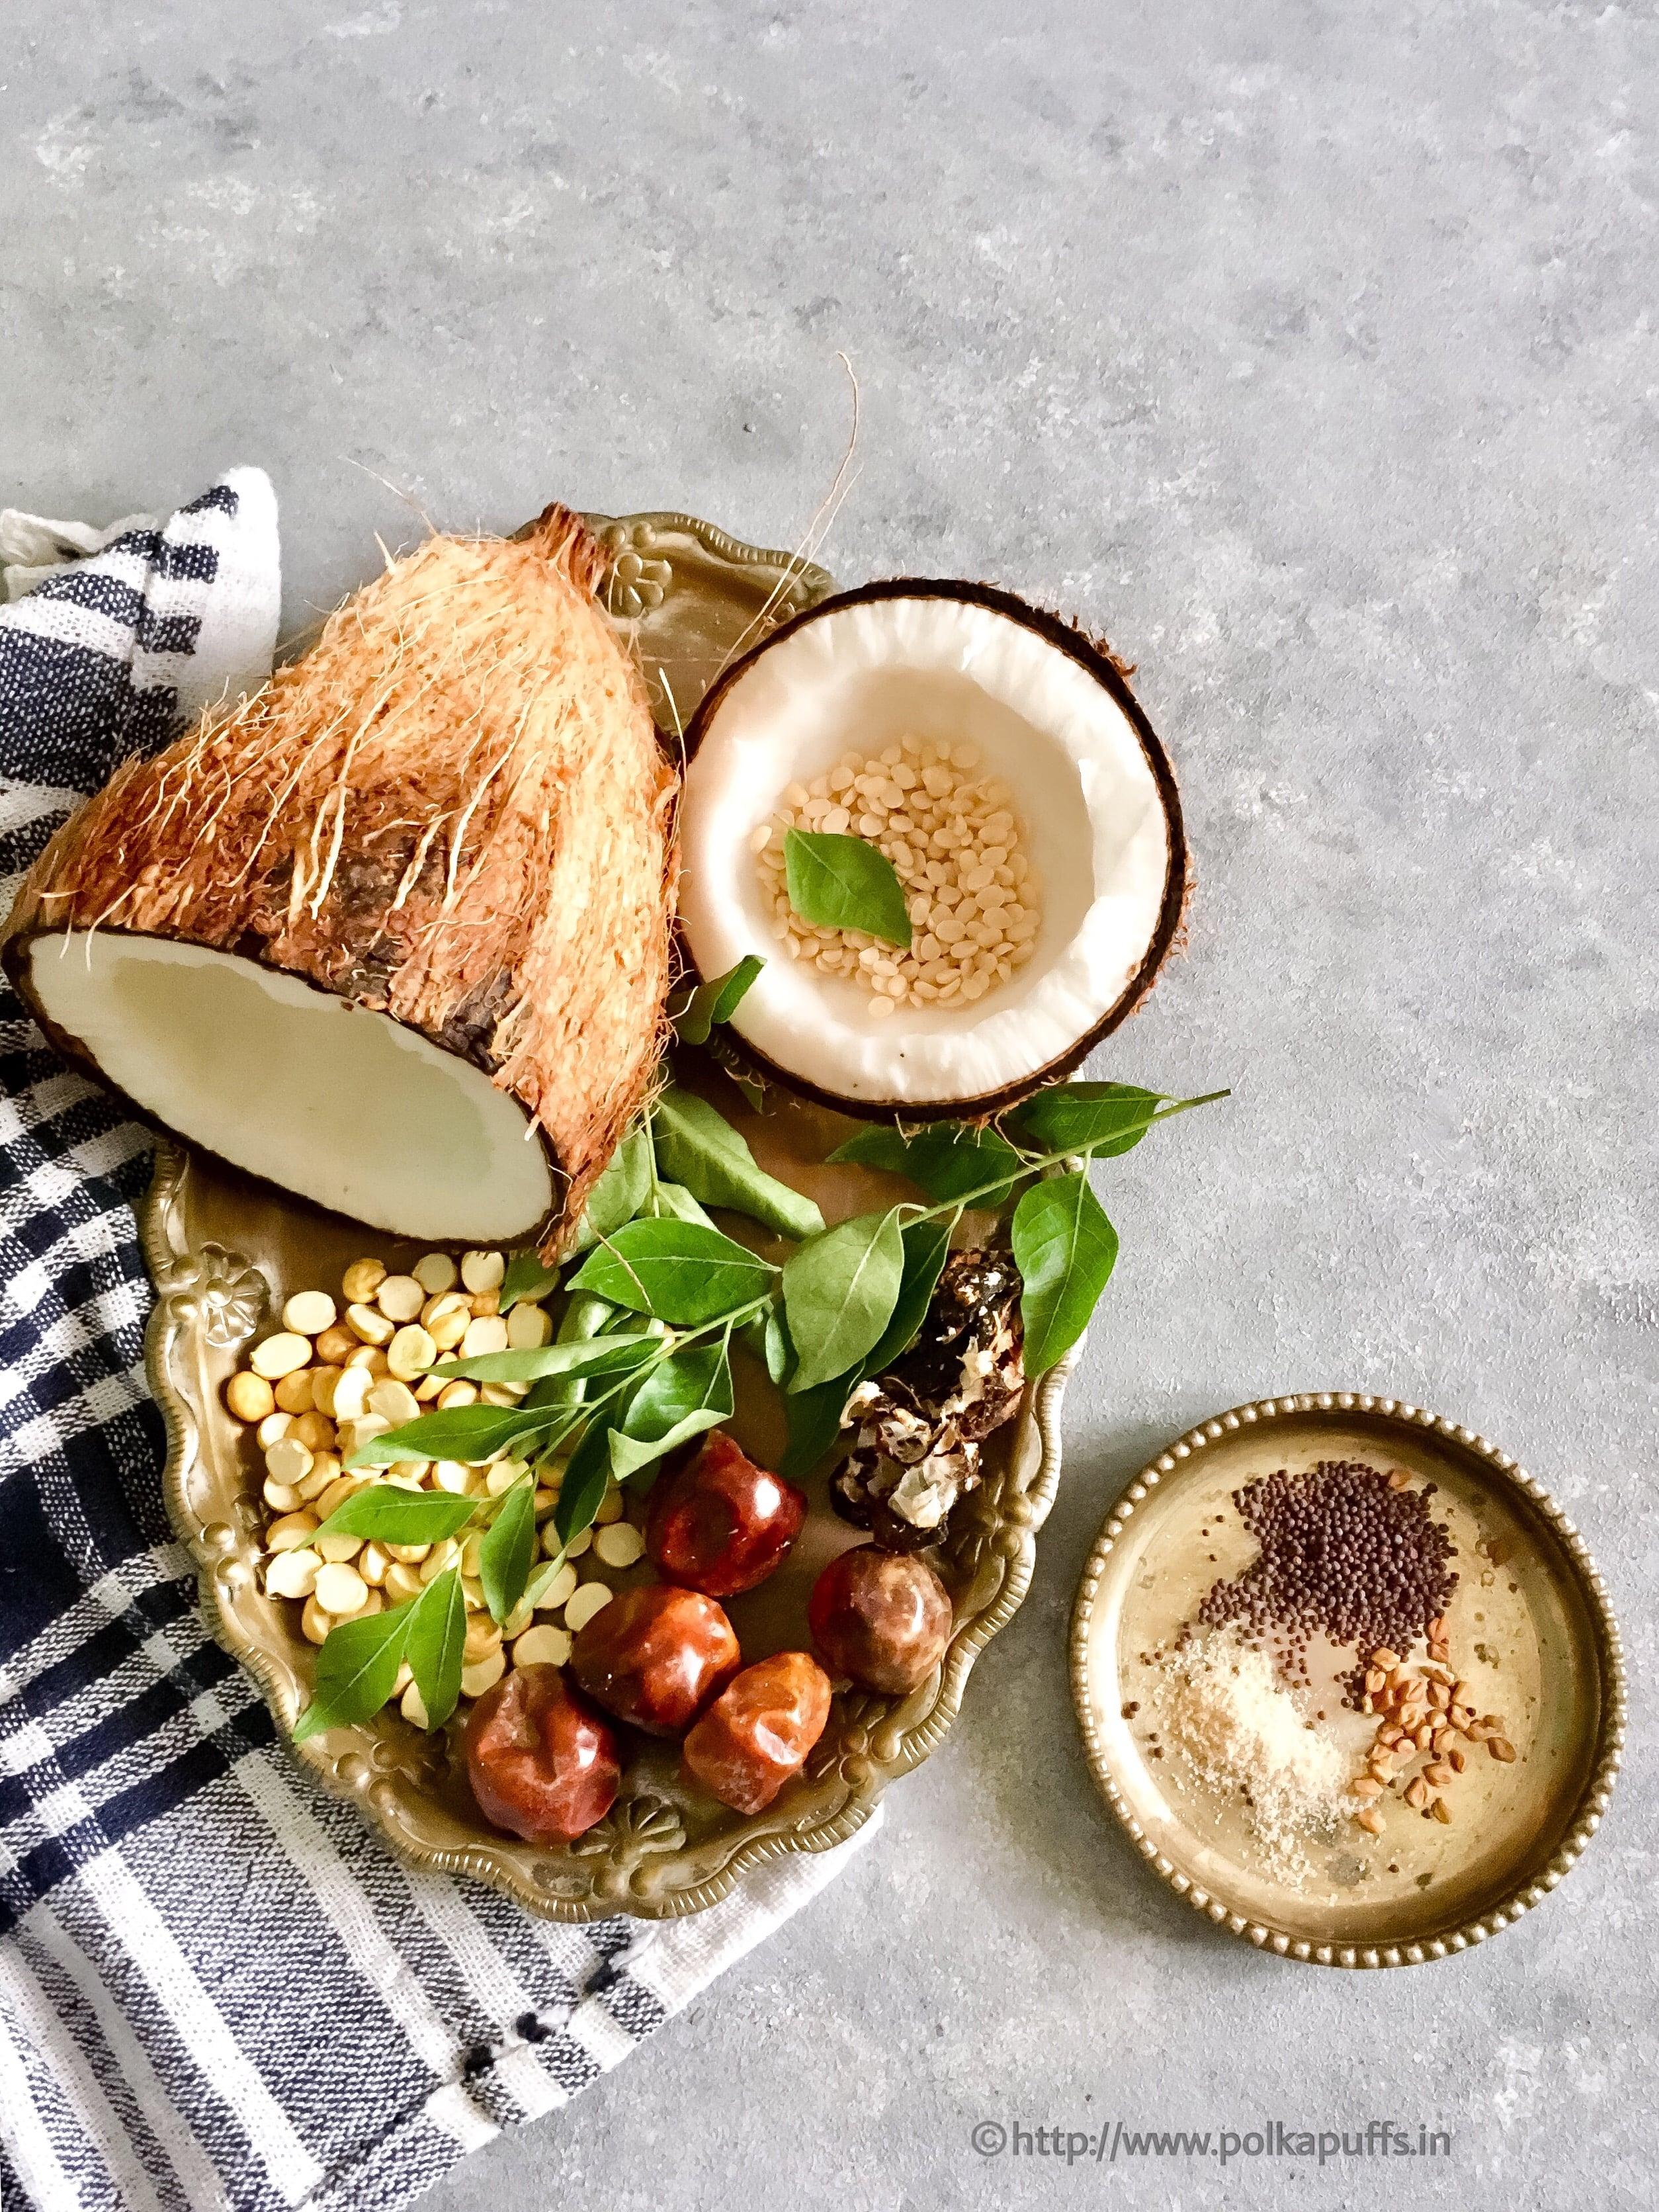 Compressed white udupi Coconut chutney 1